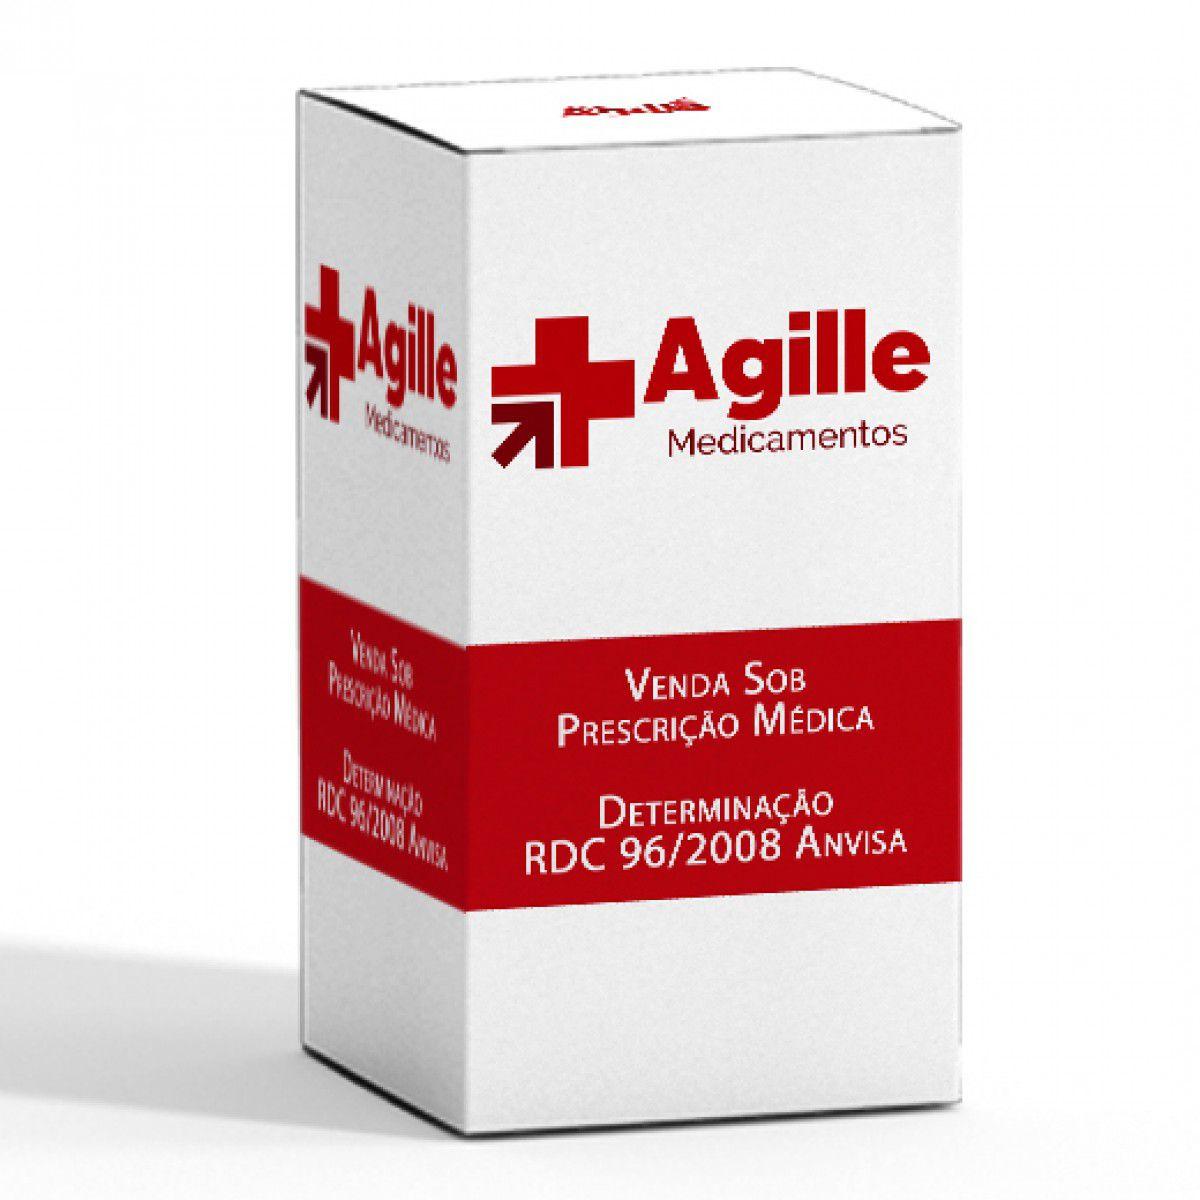 GONAL F 300 UI/0,5 ML C/1 CANETA + 8 AGULHAS  - Agille Speciality